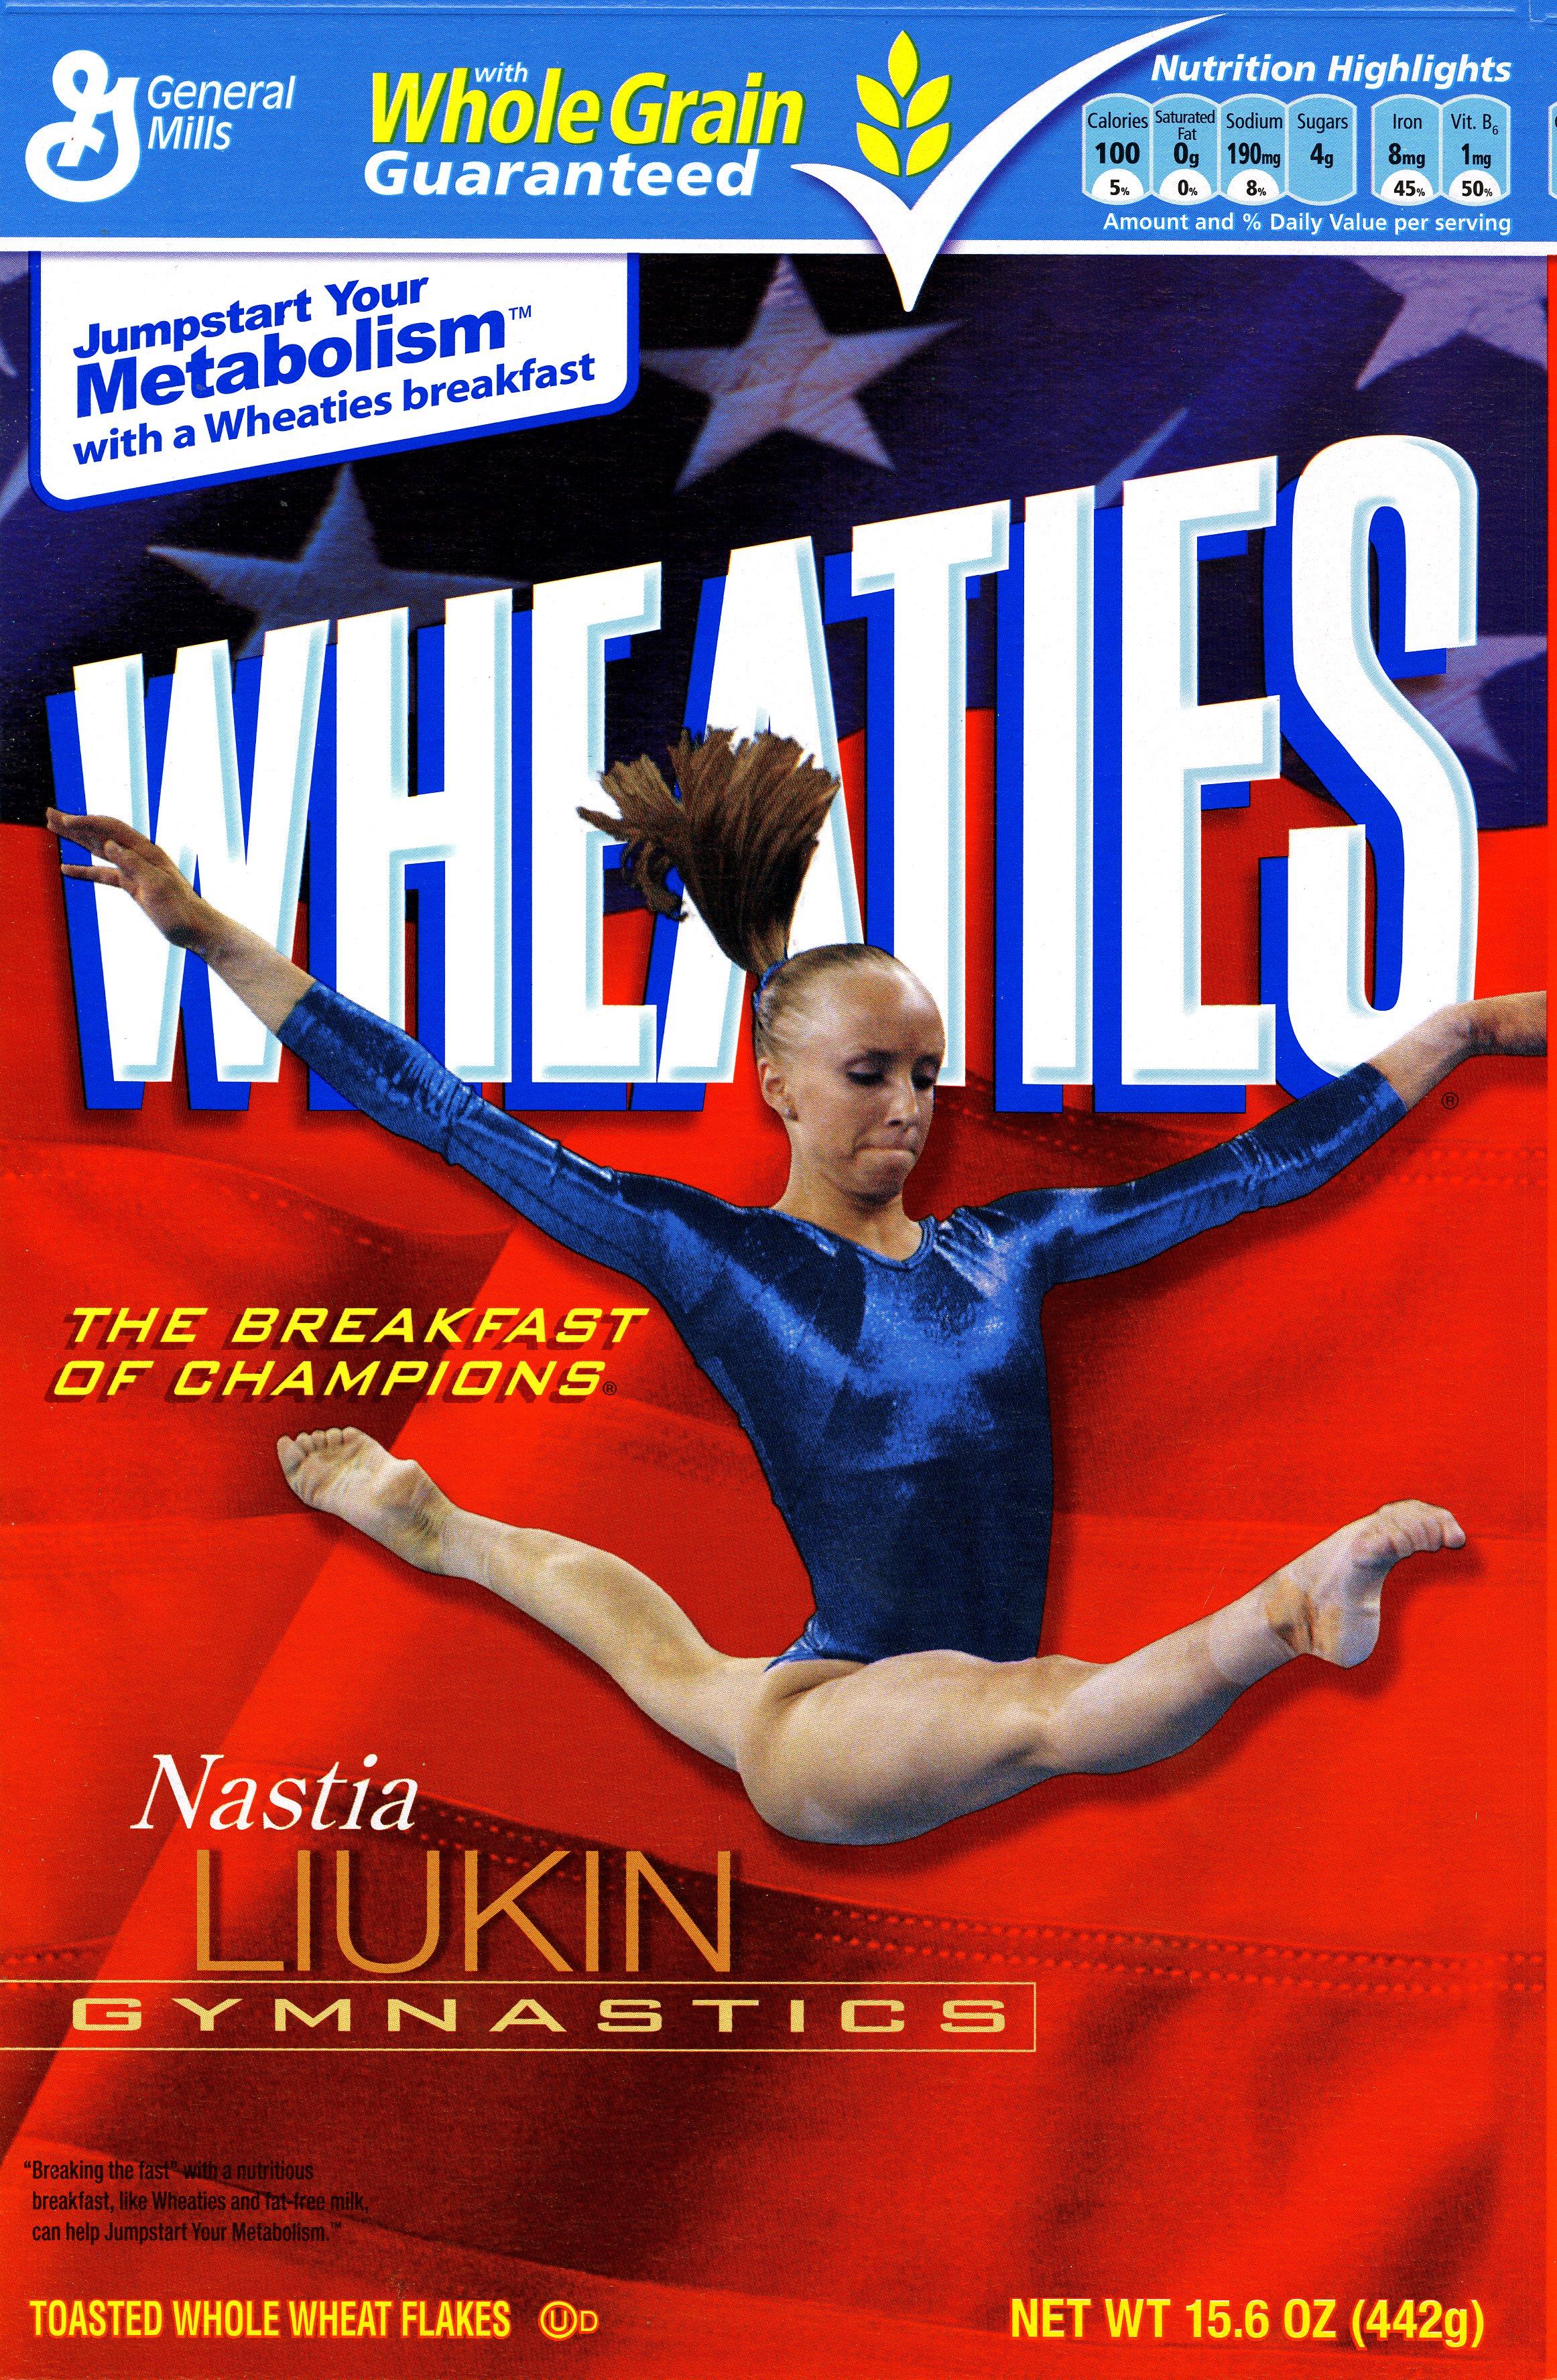 Nastia Liukin on the Wheaties box.